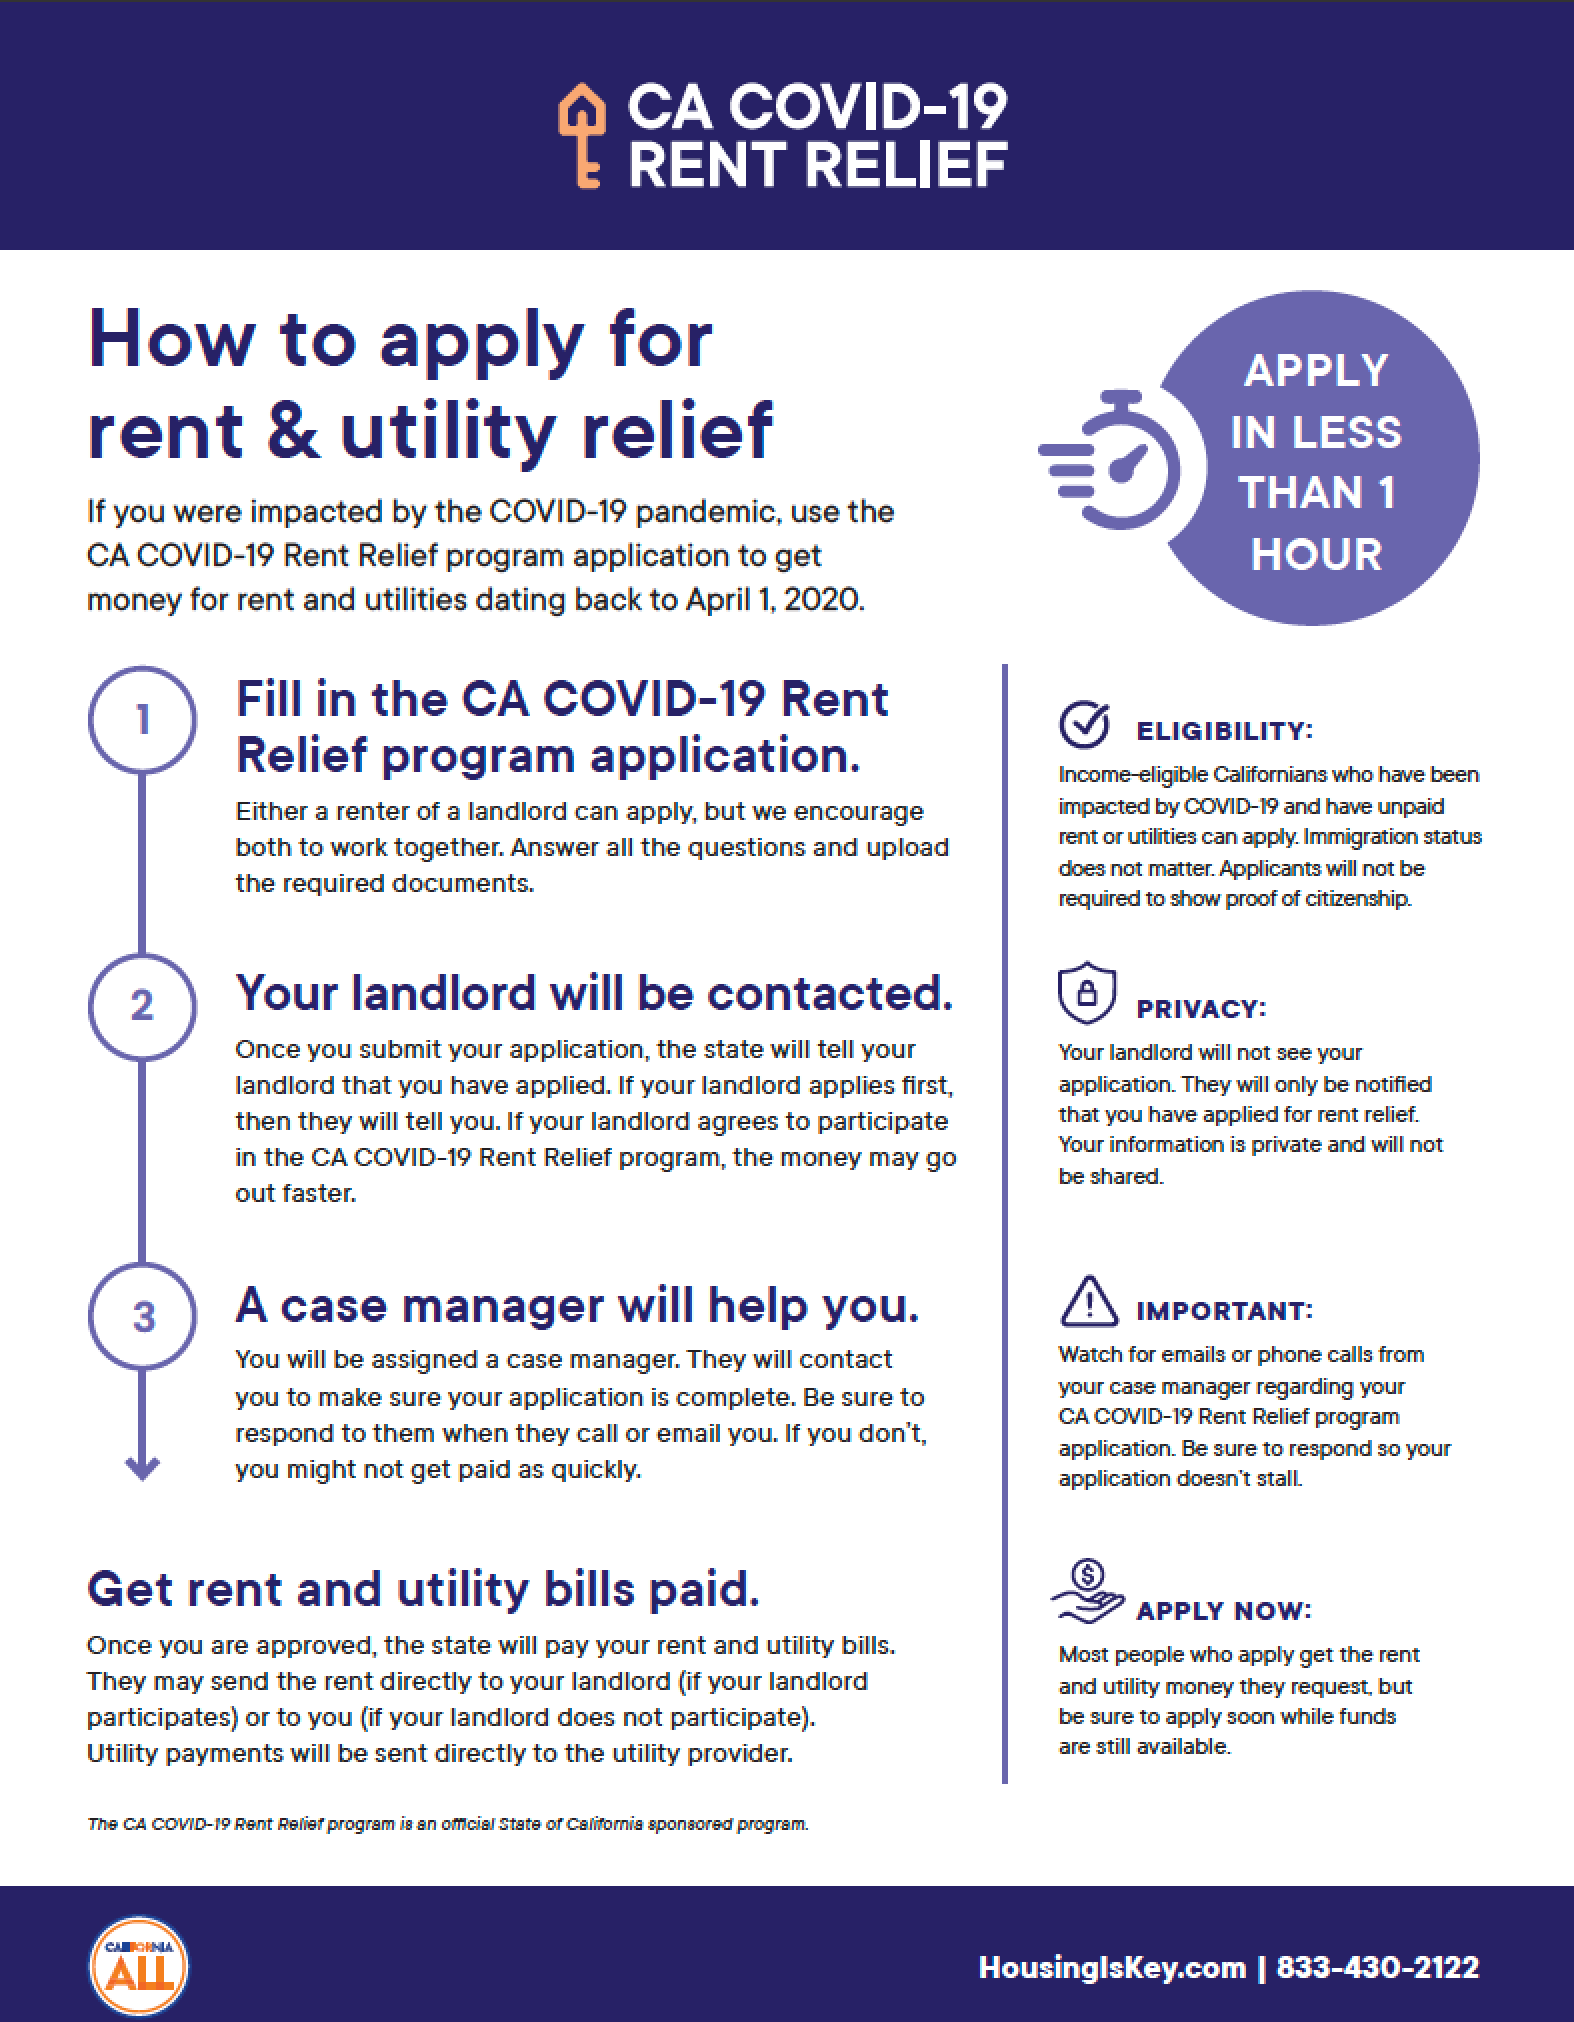 CA Covid-19 Rent Relief